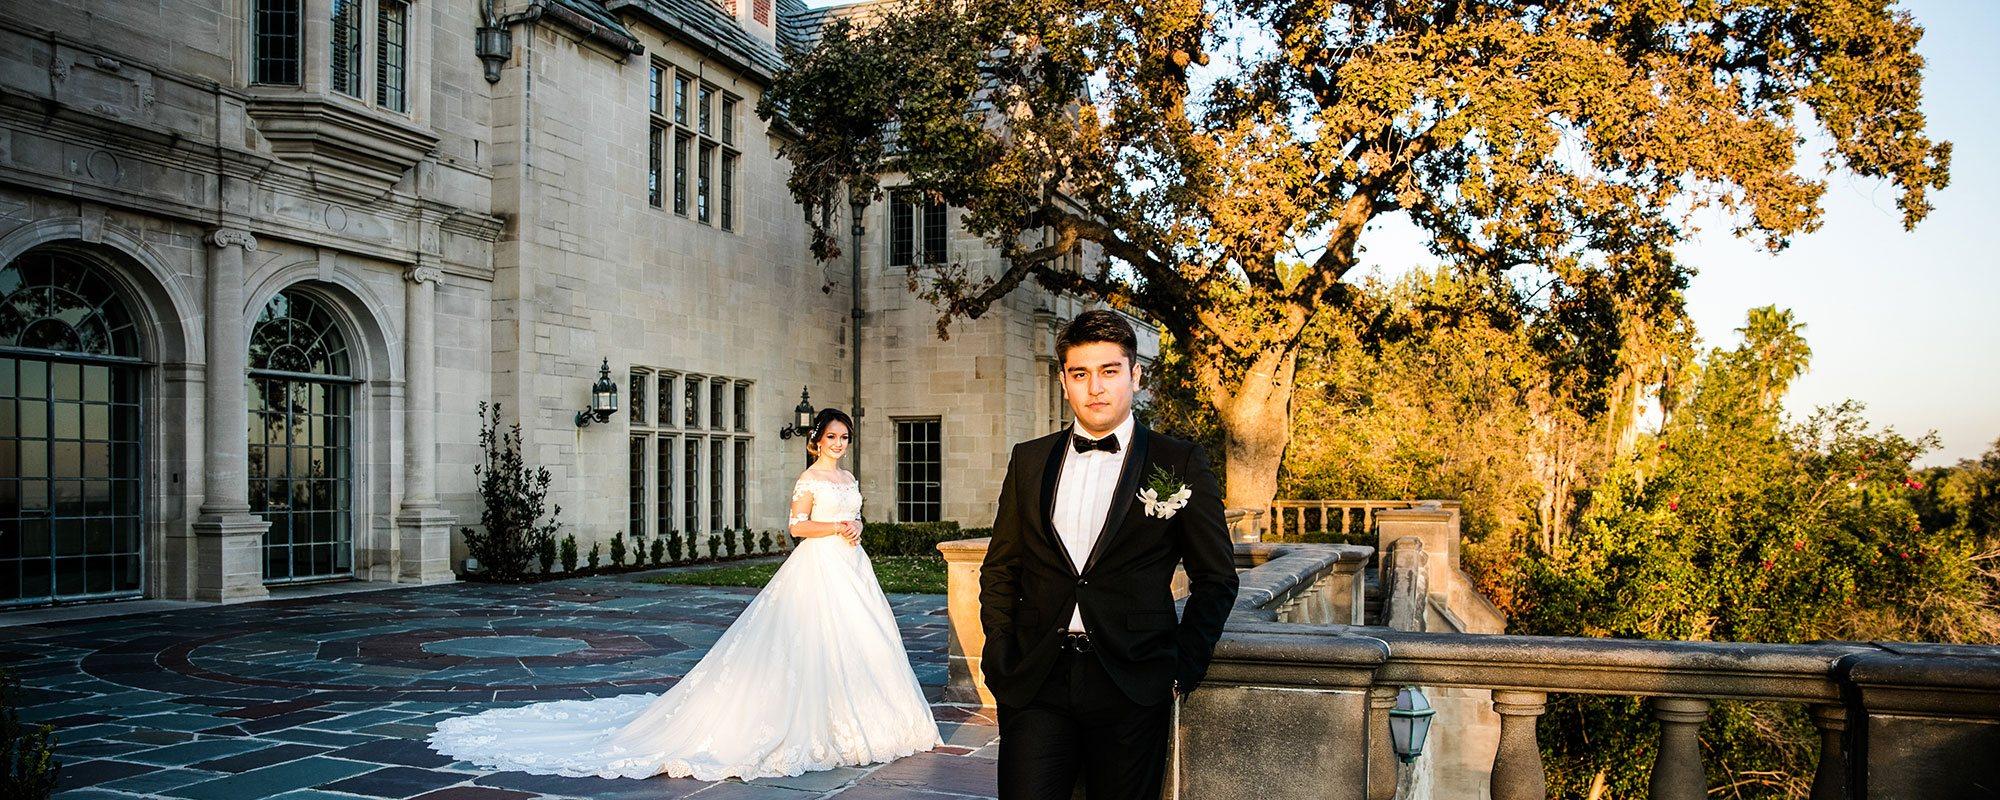 Los angeles wedding photographer san diego santa barbara for Affordable wedding photographer and videographer